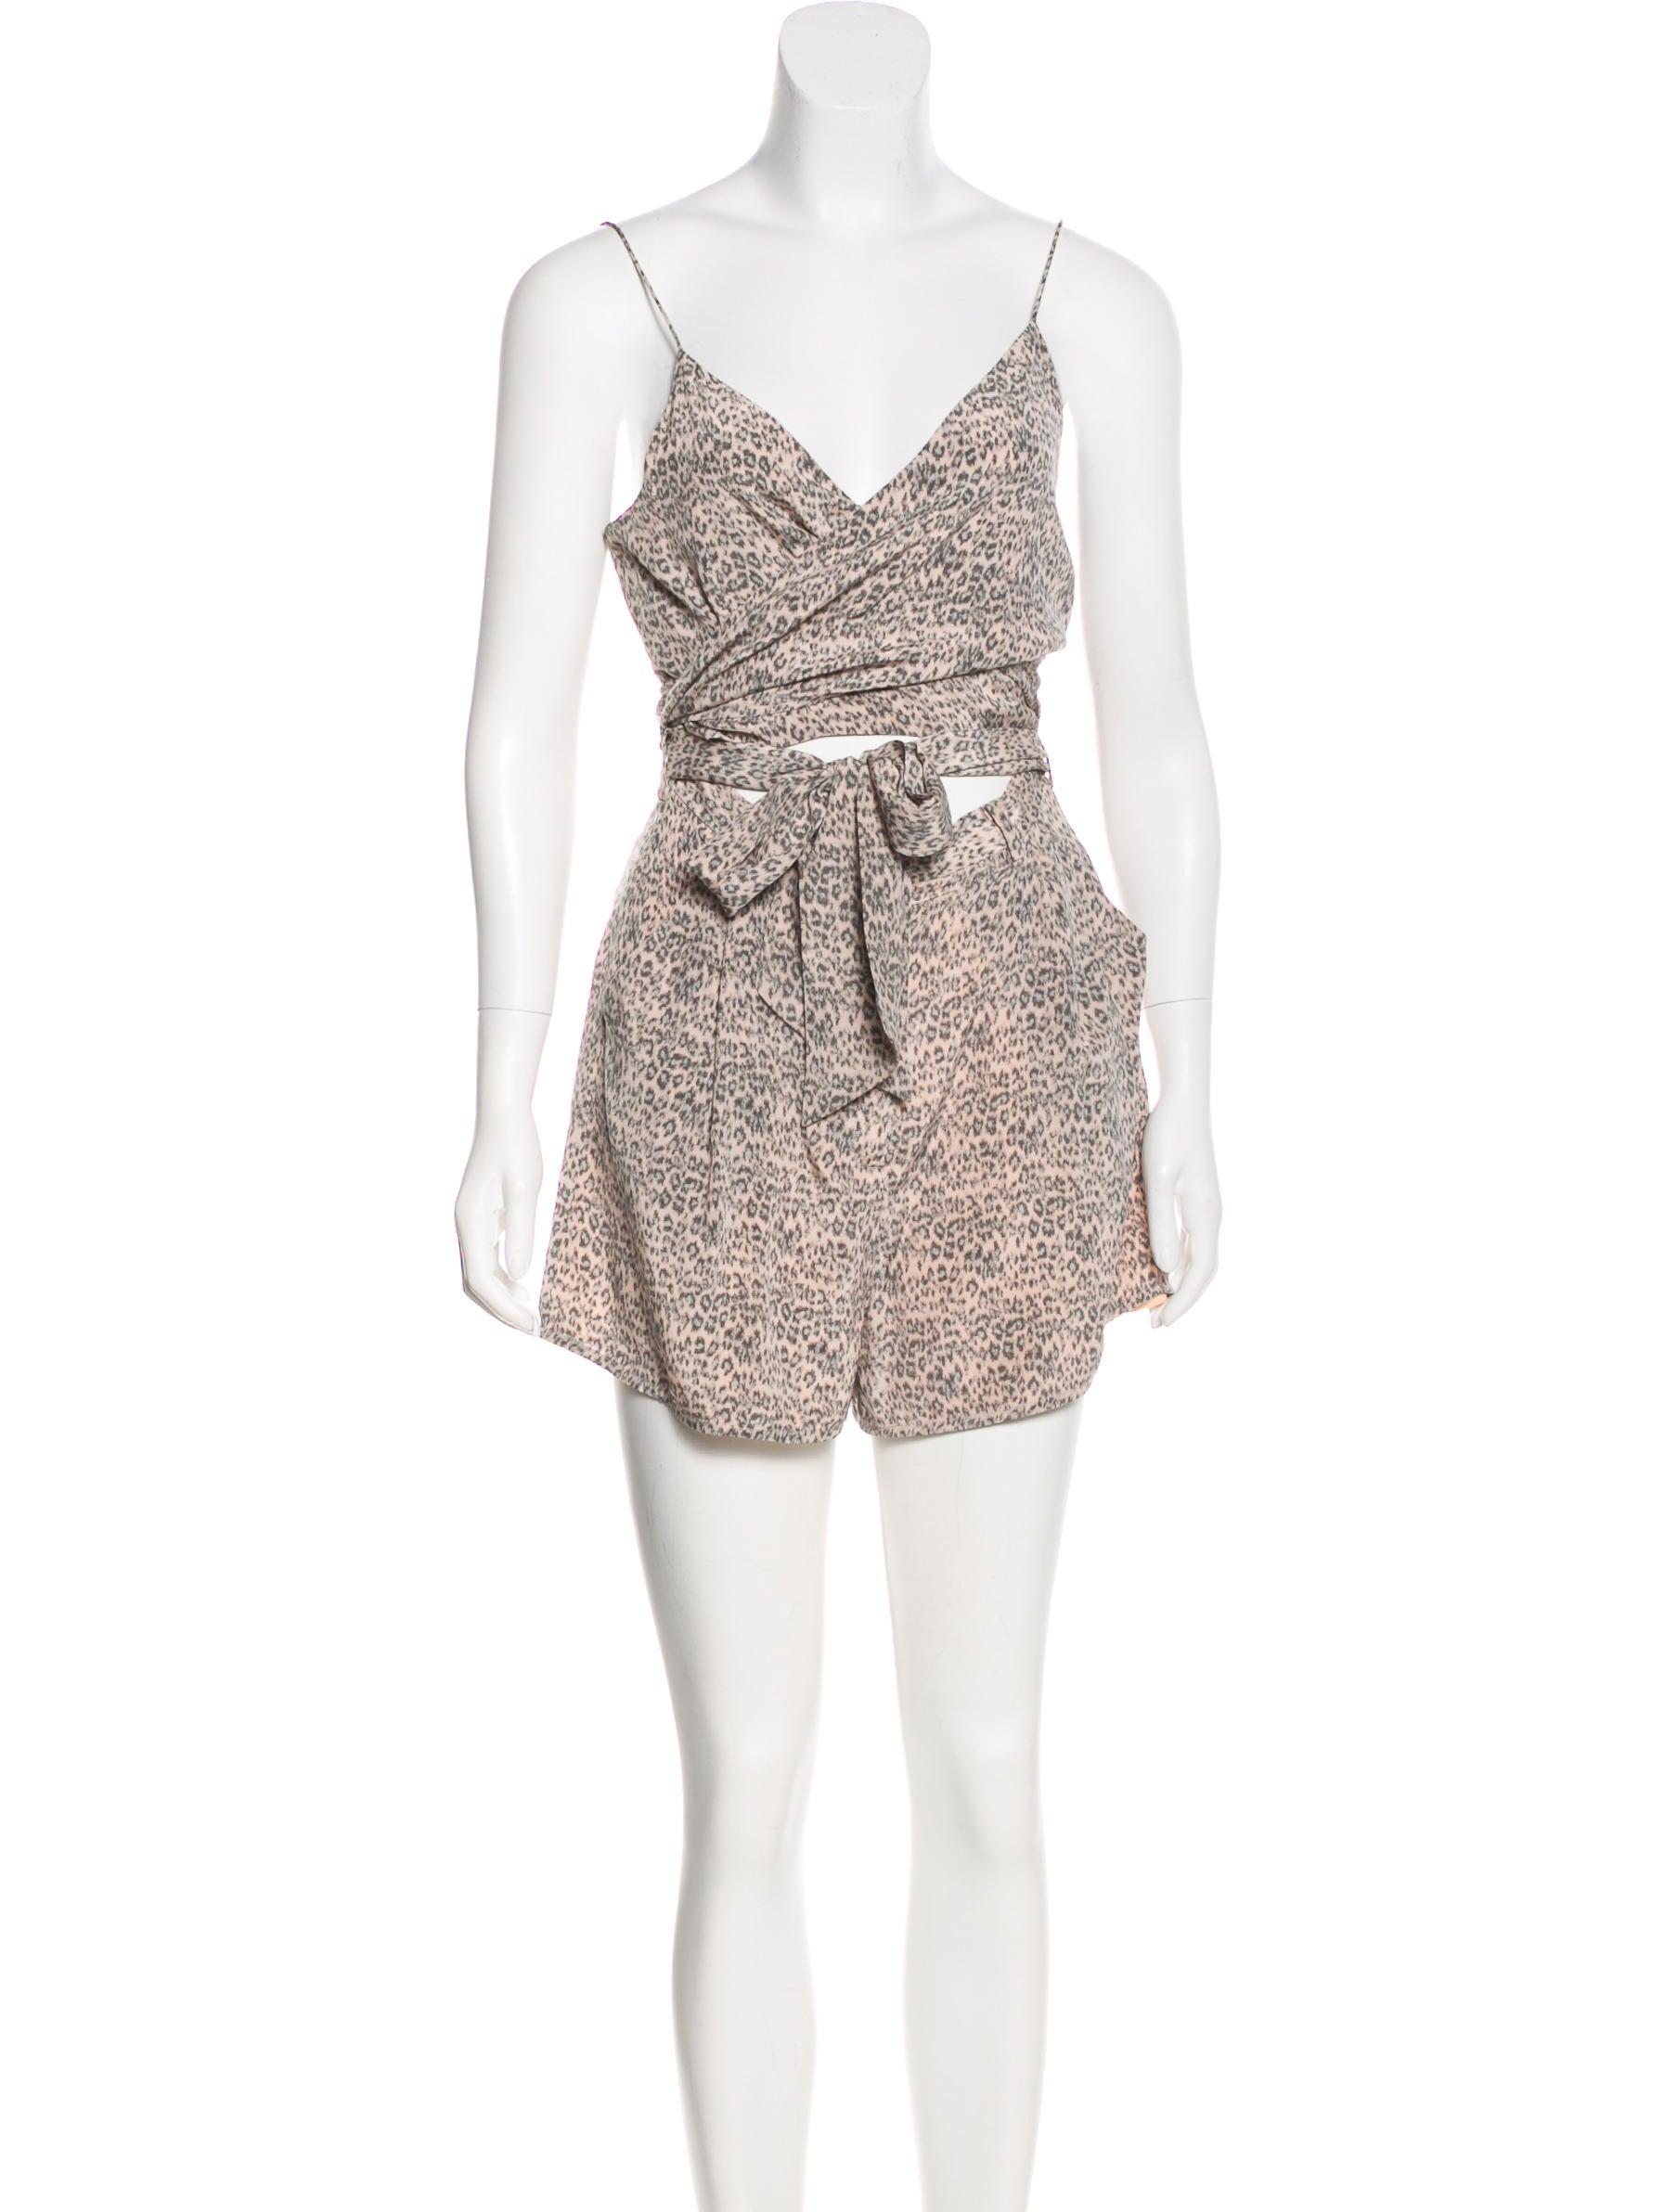 2c59bf5c4e8 Zimmermann Silk Leopard Print Romper - Clothing - WZI24490